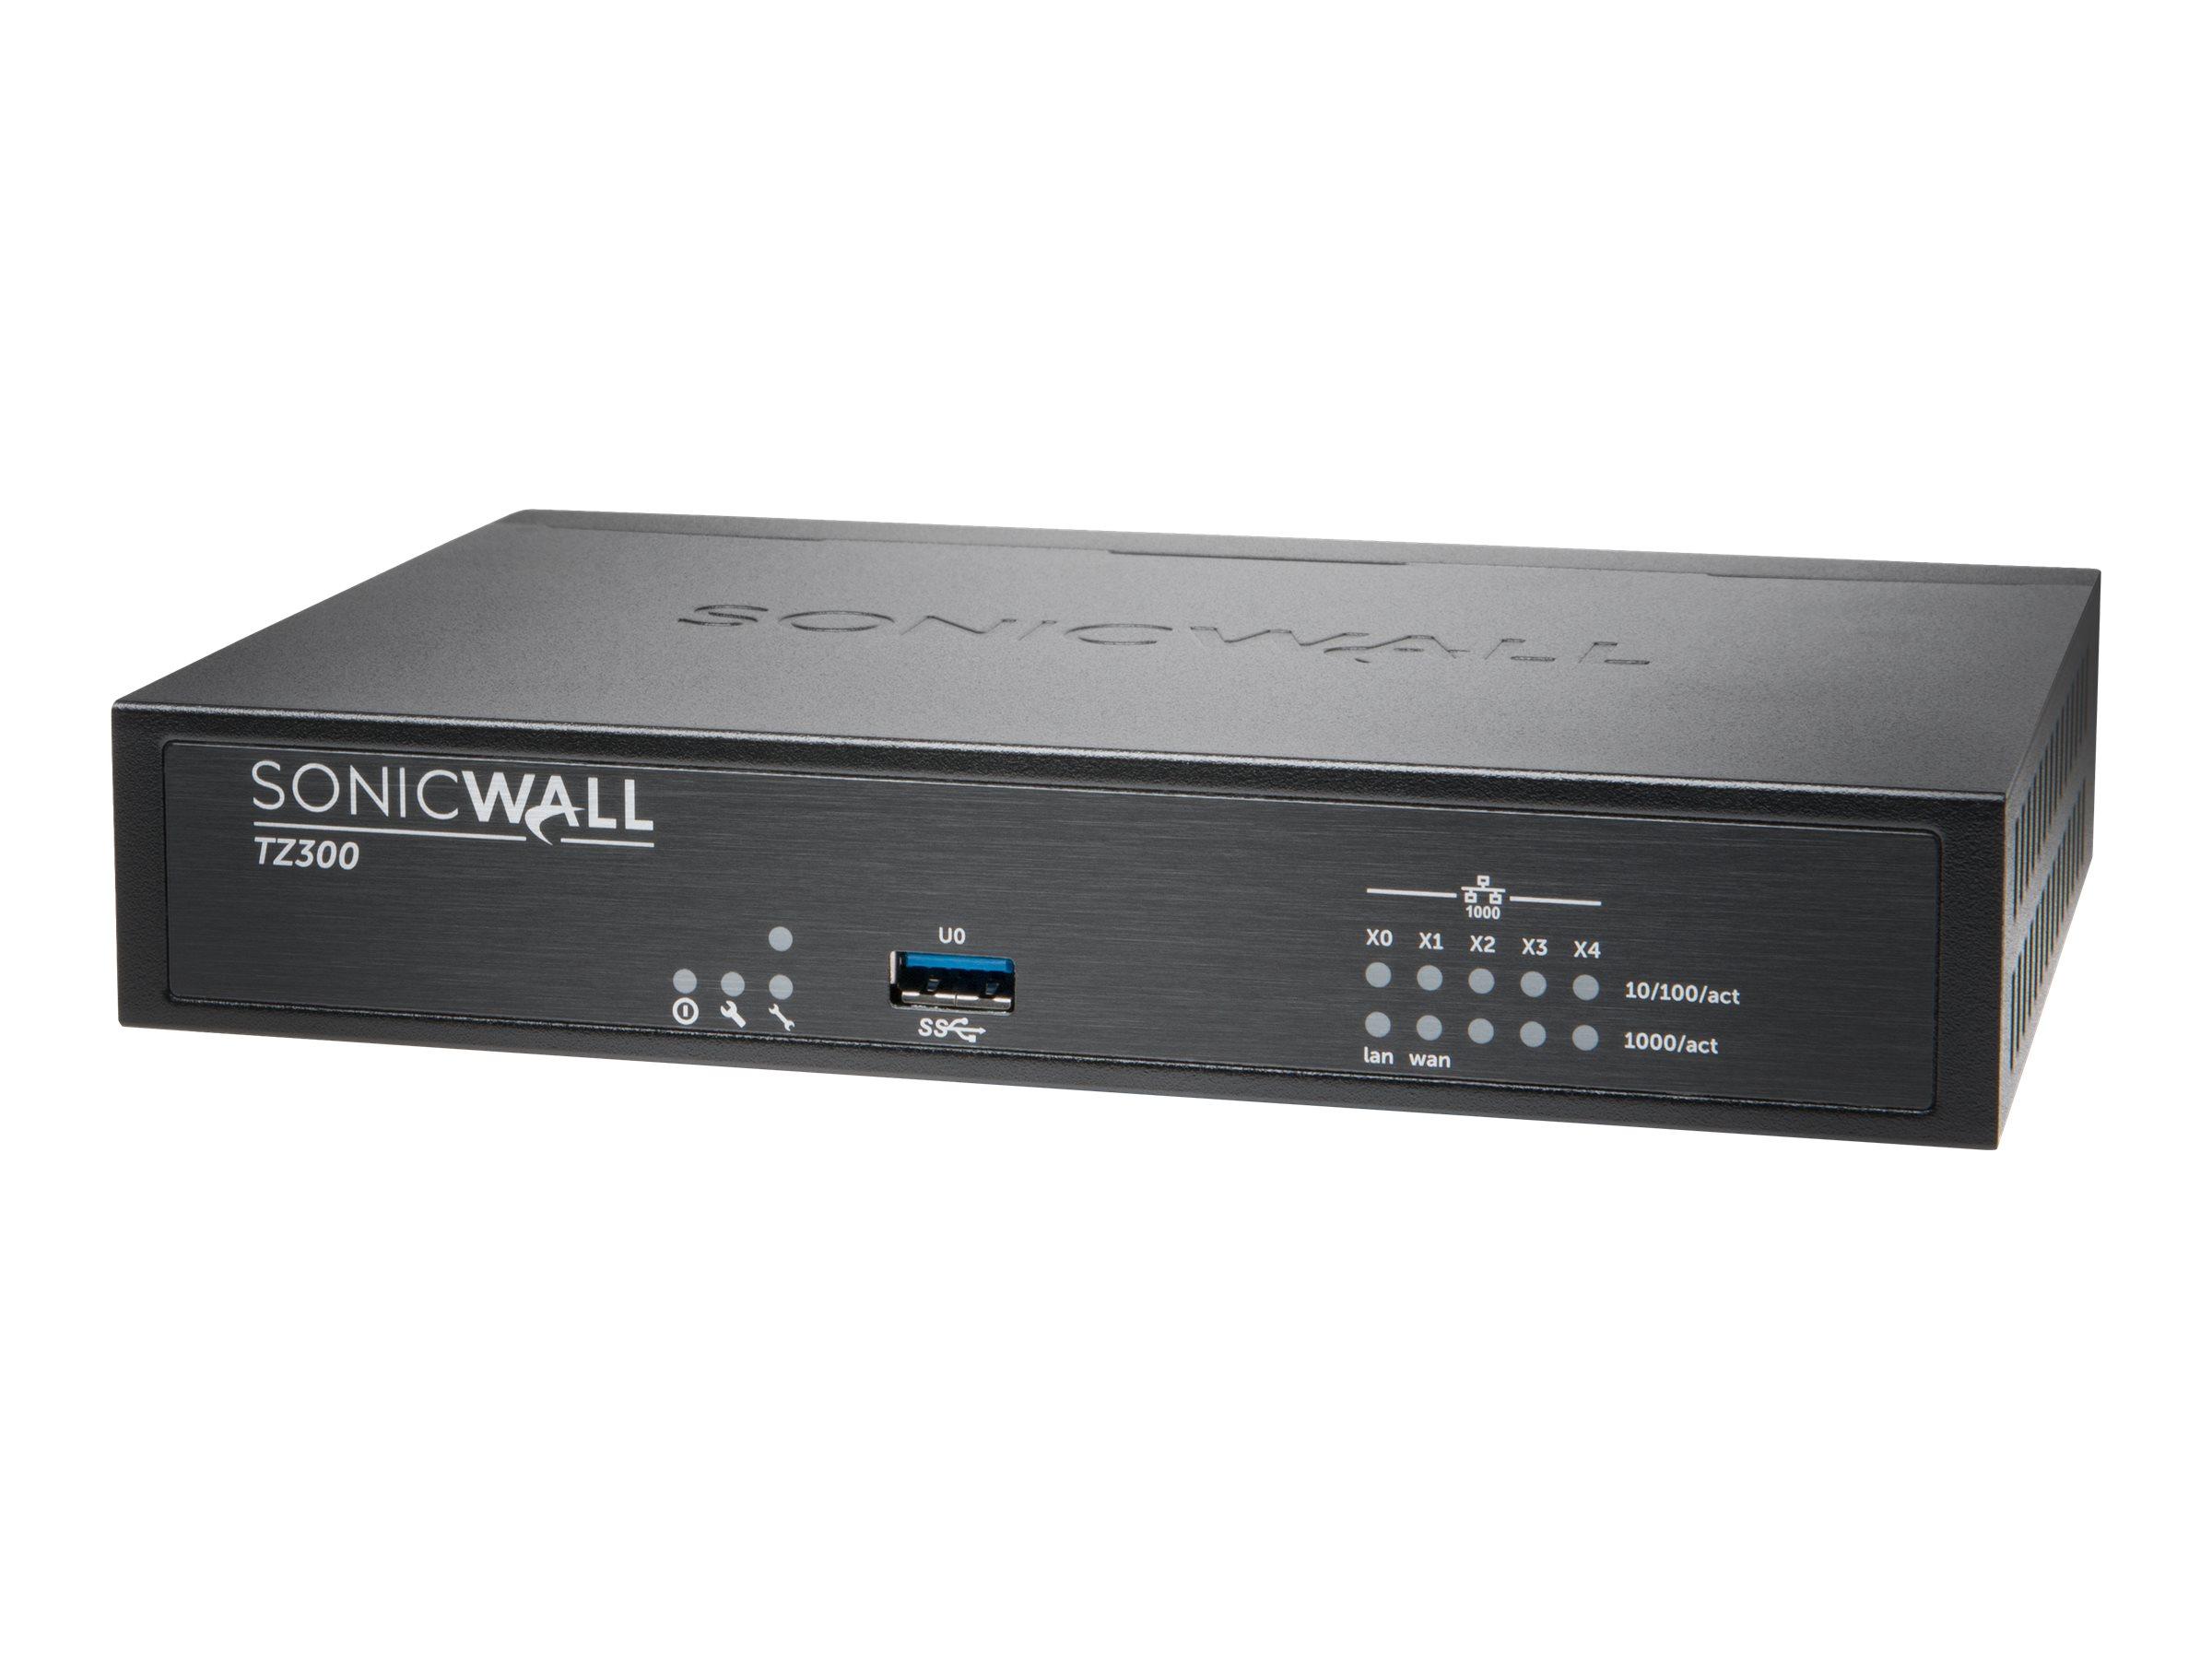 SonicWall TZ300 - Sicherheitsgerät - 5 Anschlüsse - GigE - NFR